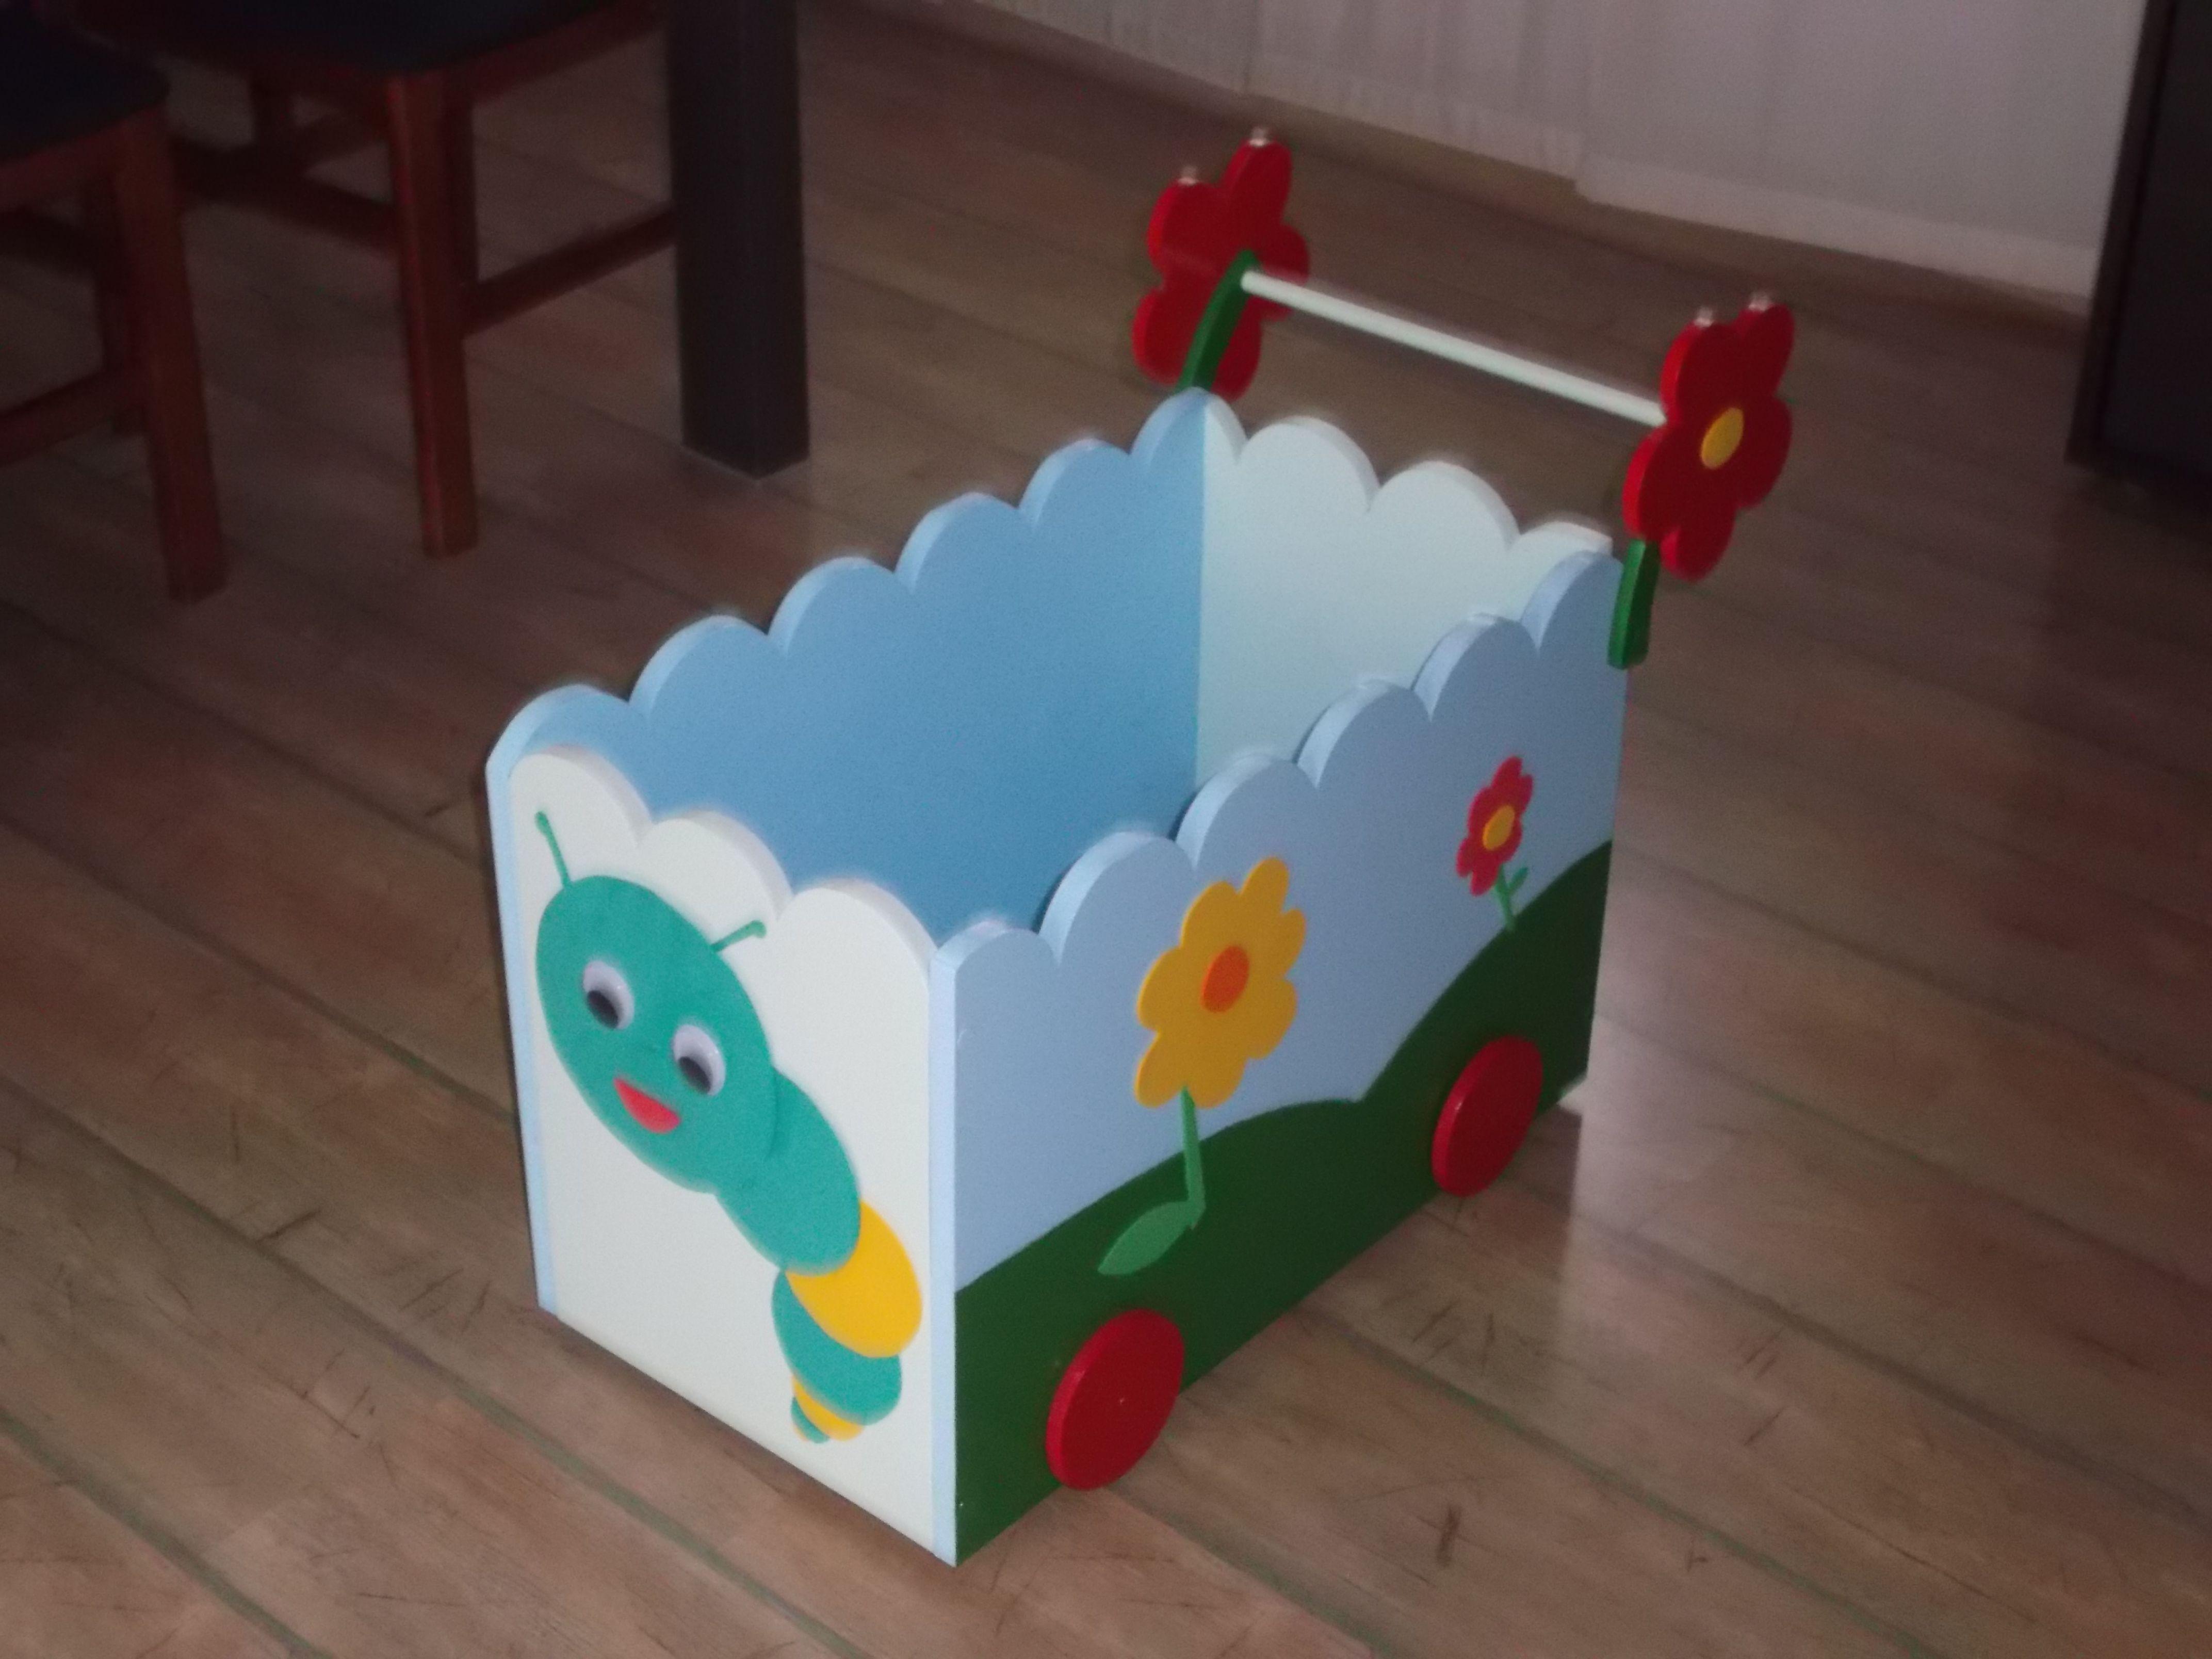 Carrito de madera con ruedas para juguetes decoraci n - Pintura para madera ...